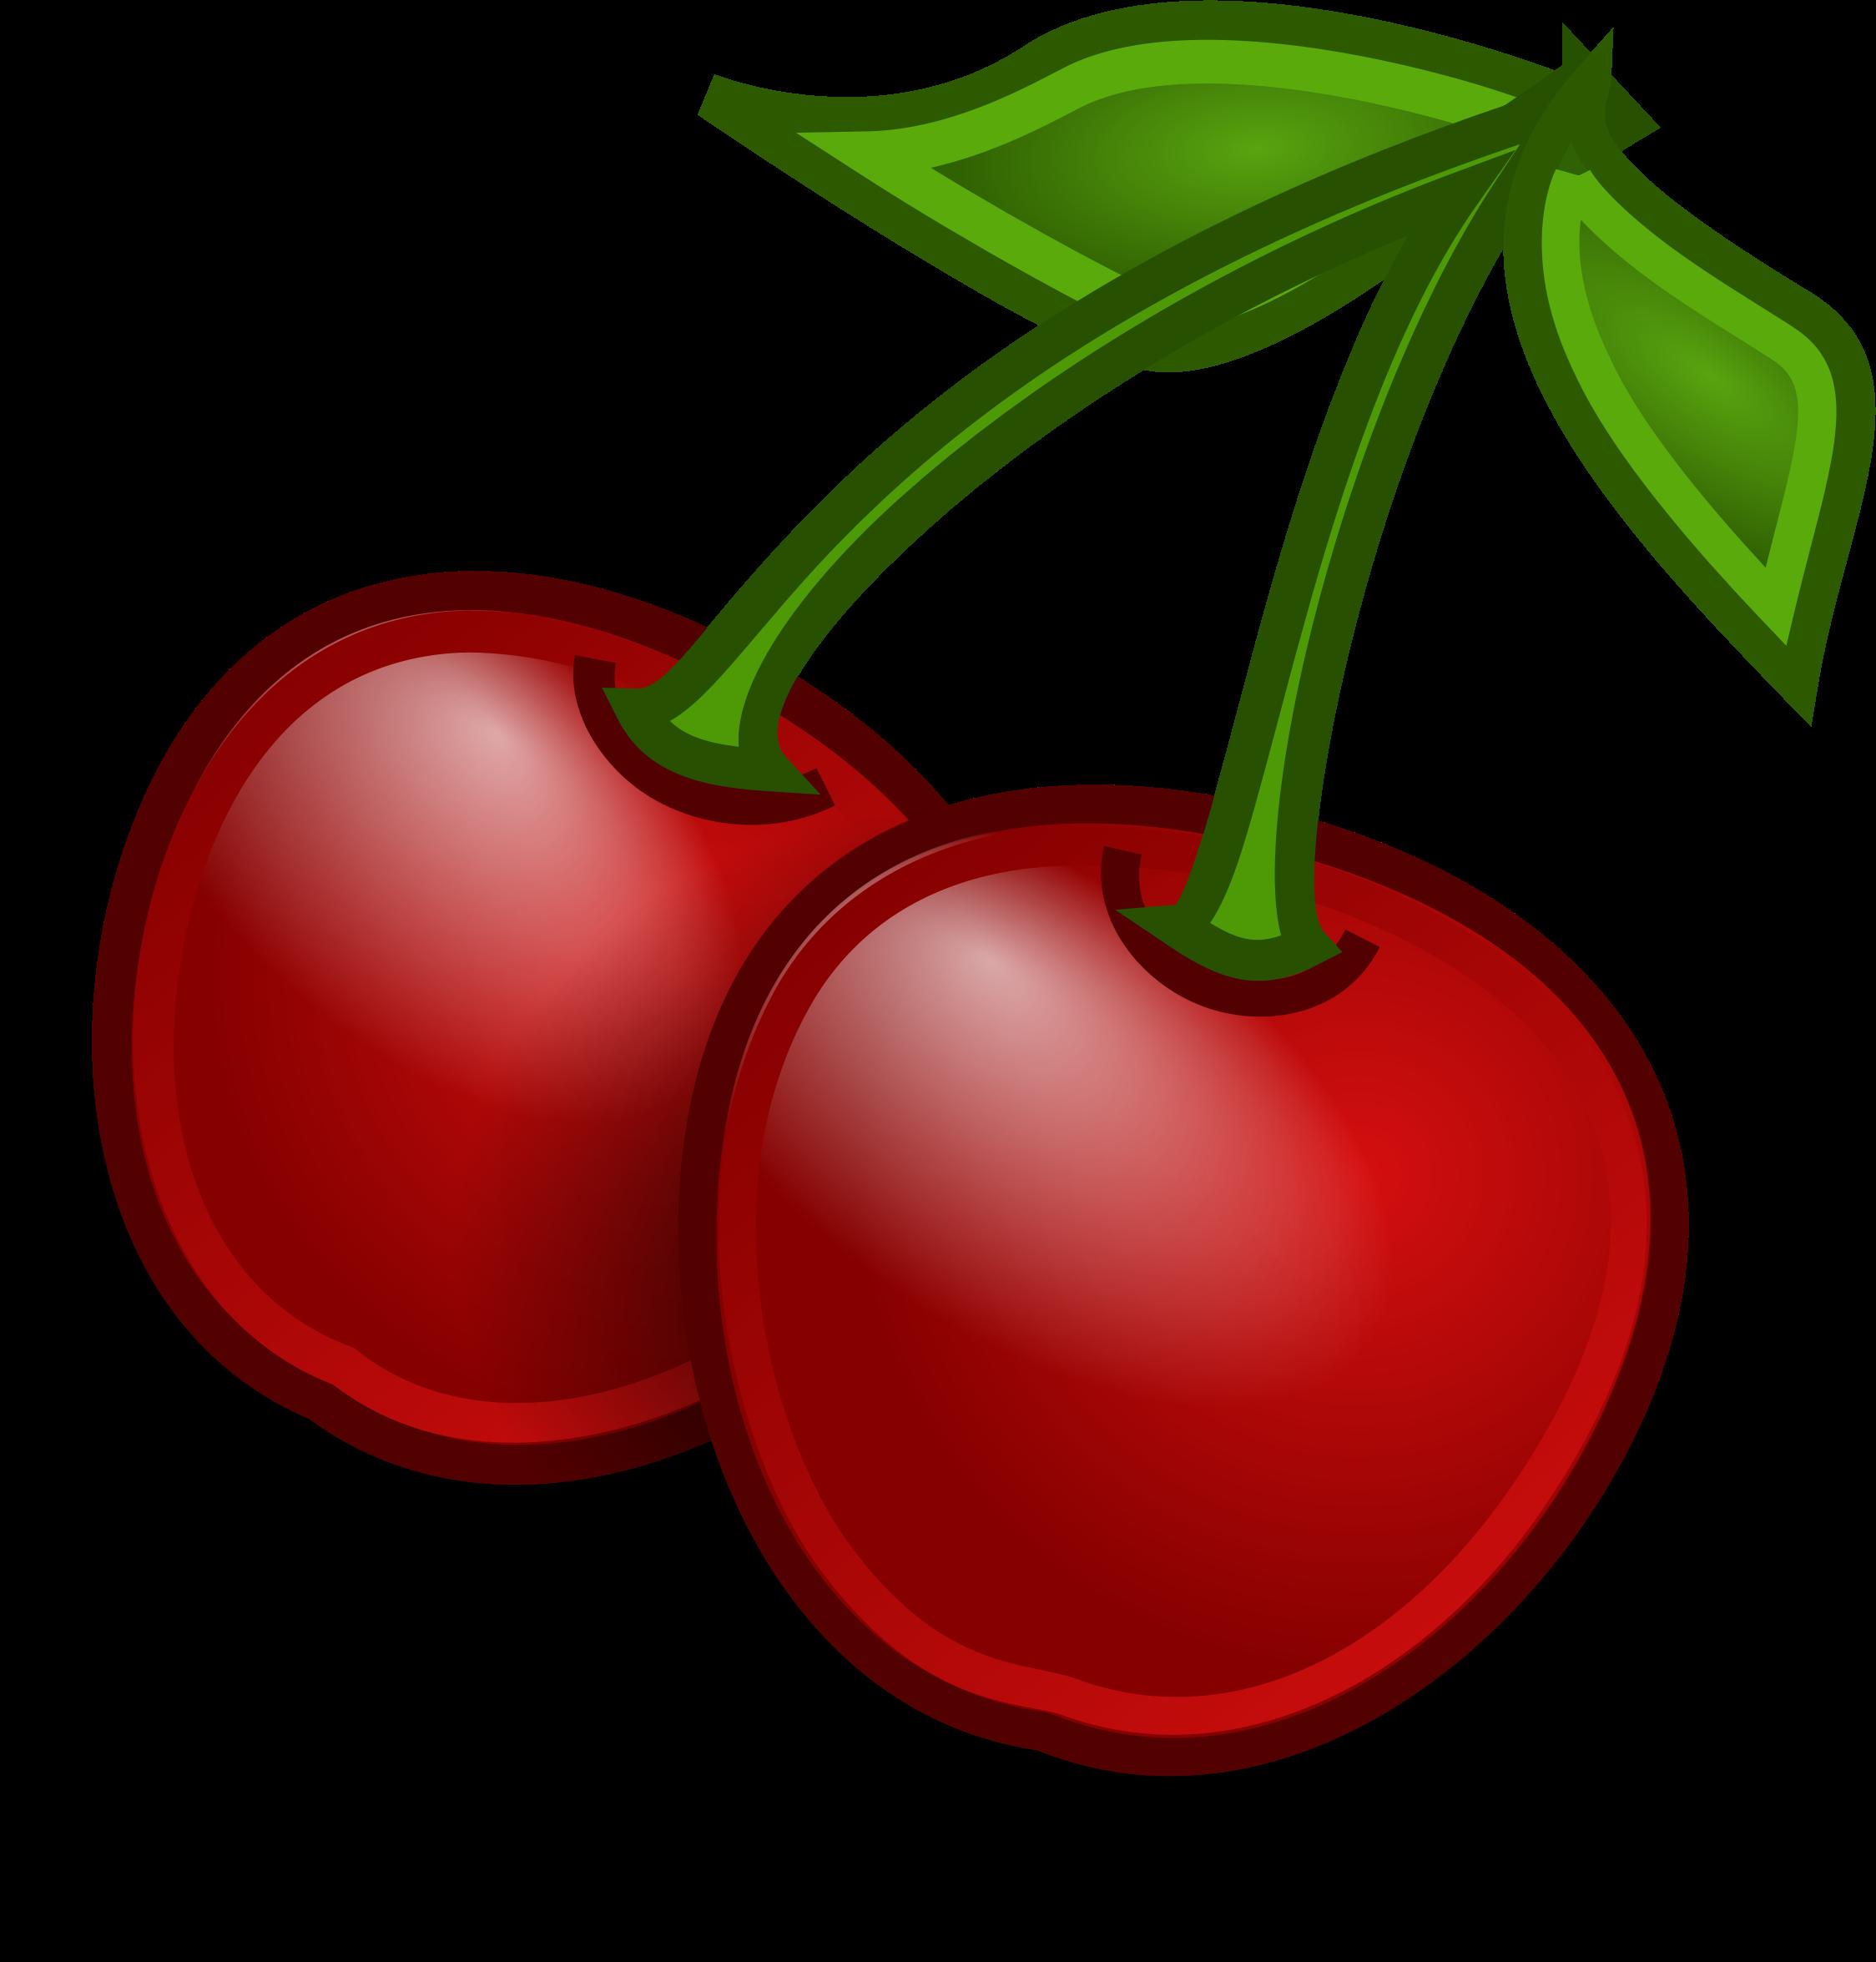 Cherries big image png. I clipart fruit